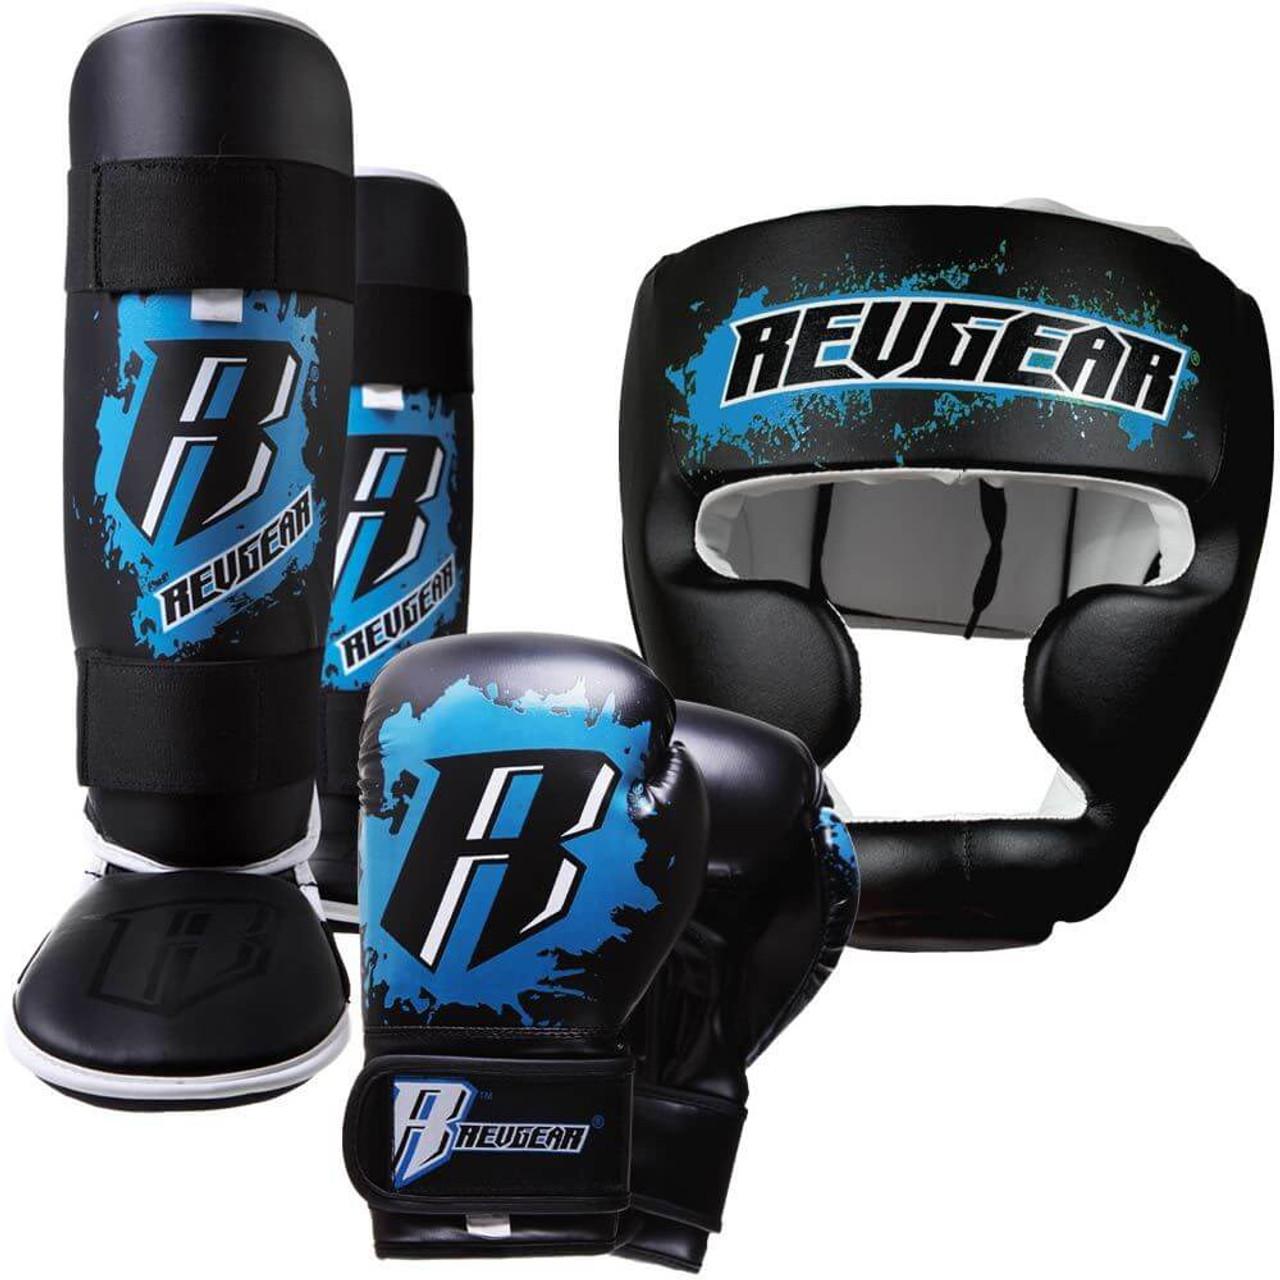 Kids Deluxe Kickboxing Kit - Blue